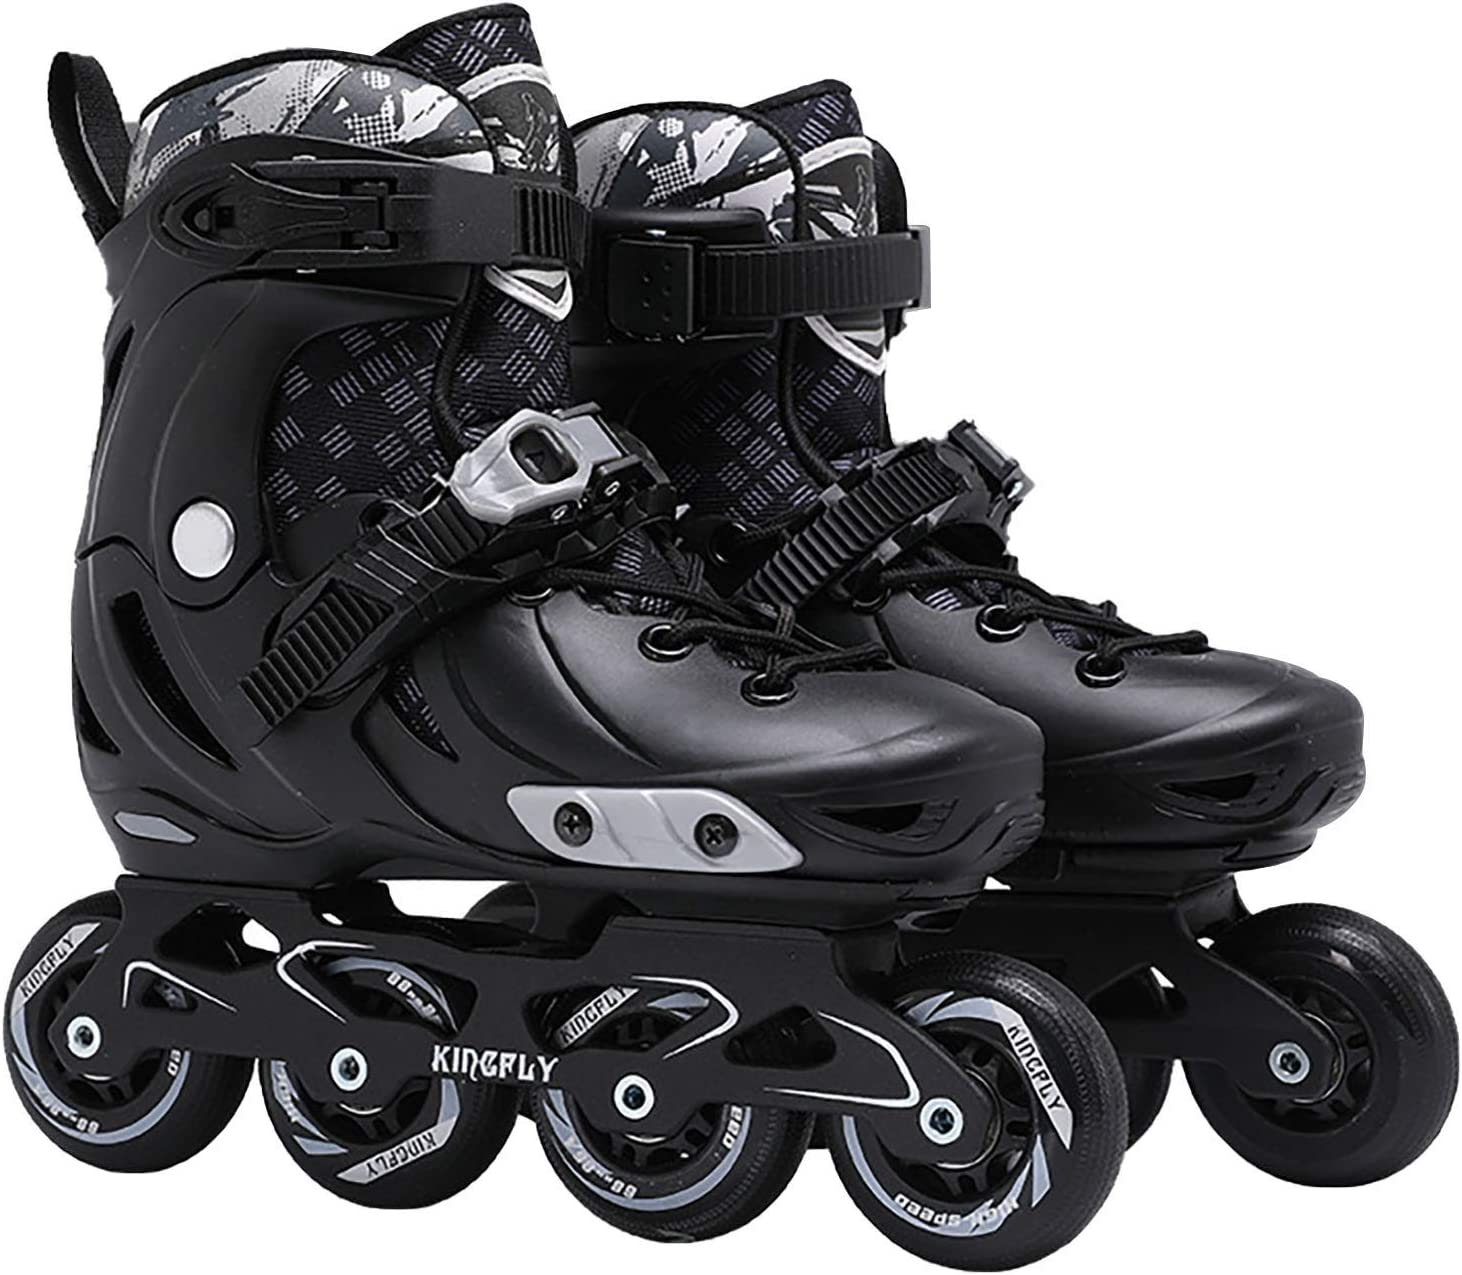 New product SALENEW very popular! Binory Inline Roller Skates 4- Quad Outdoor Indoor